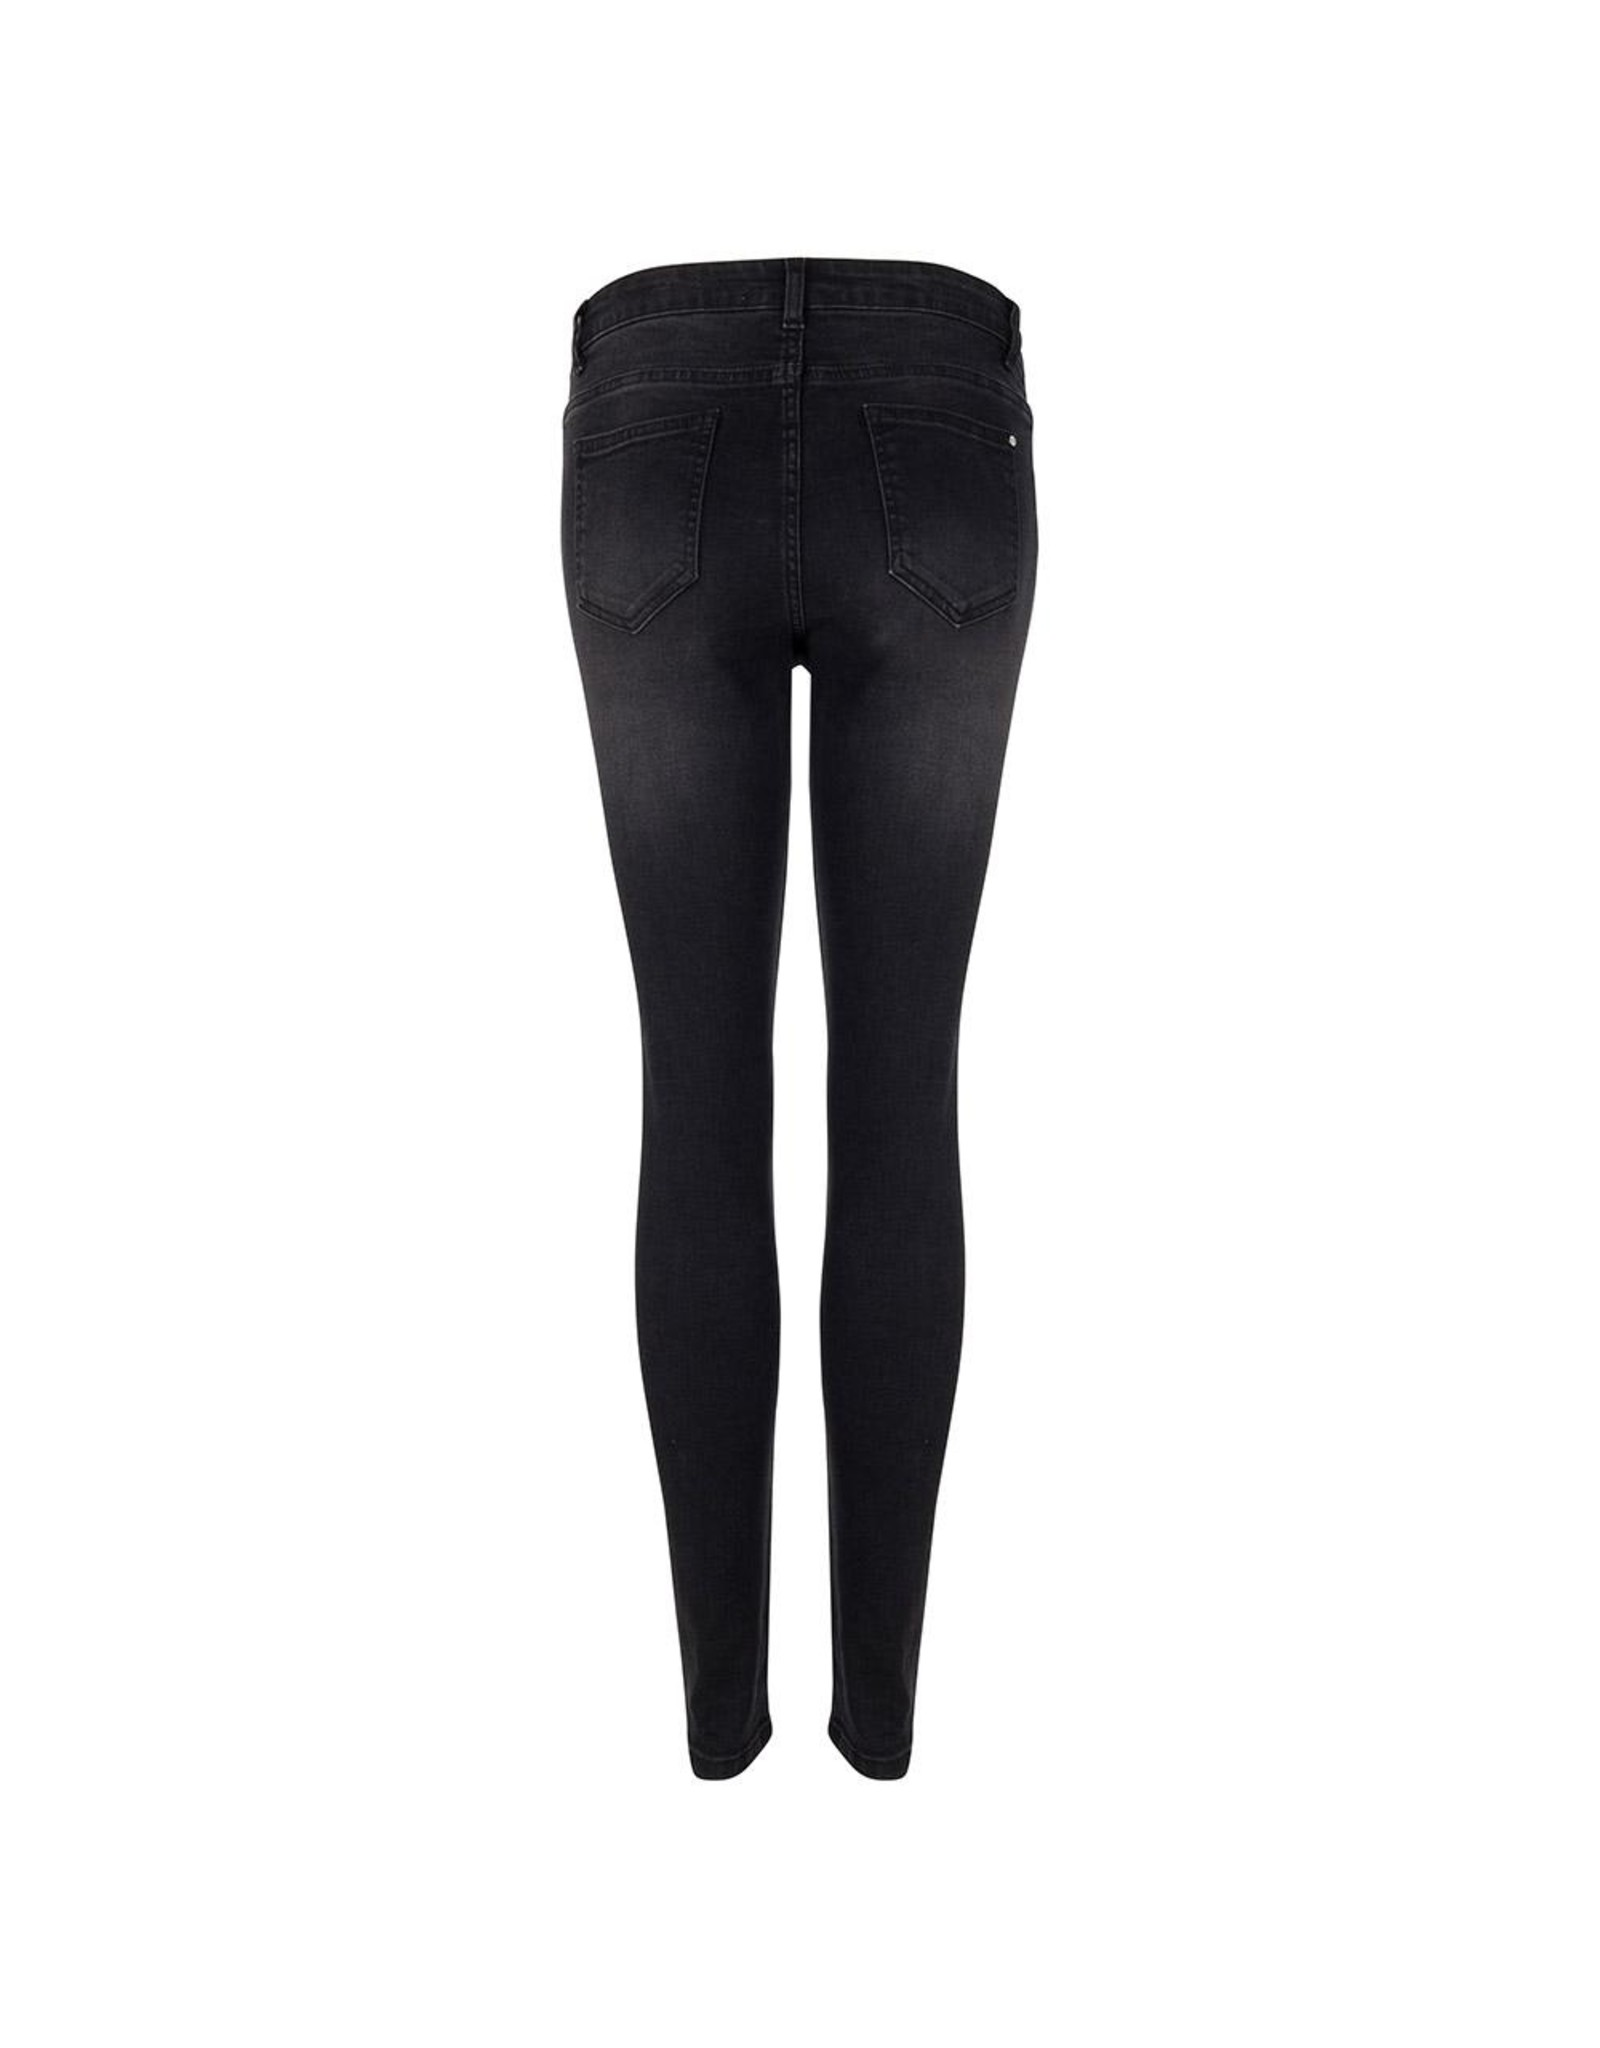 Jacky Luxury jeans black